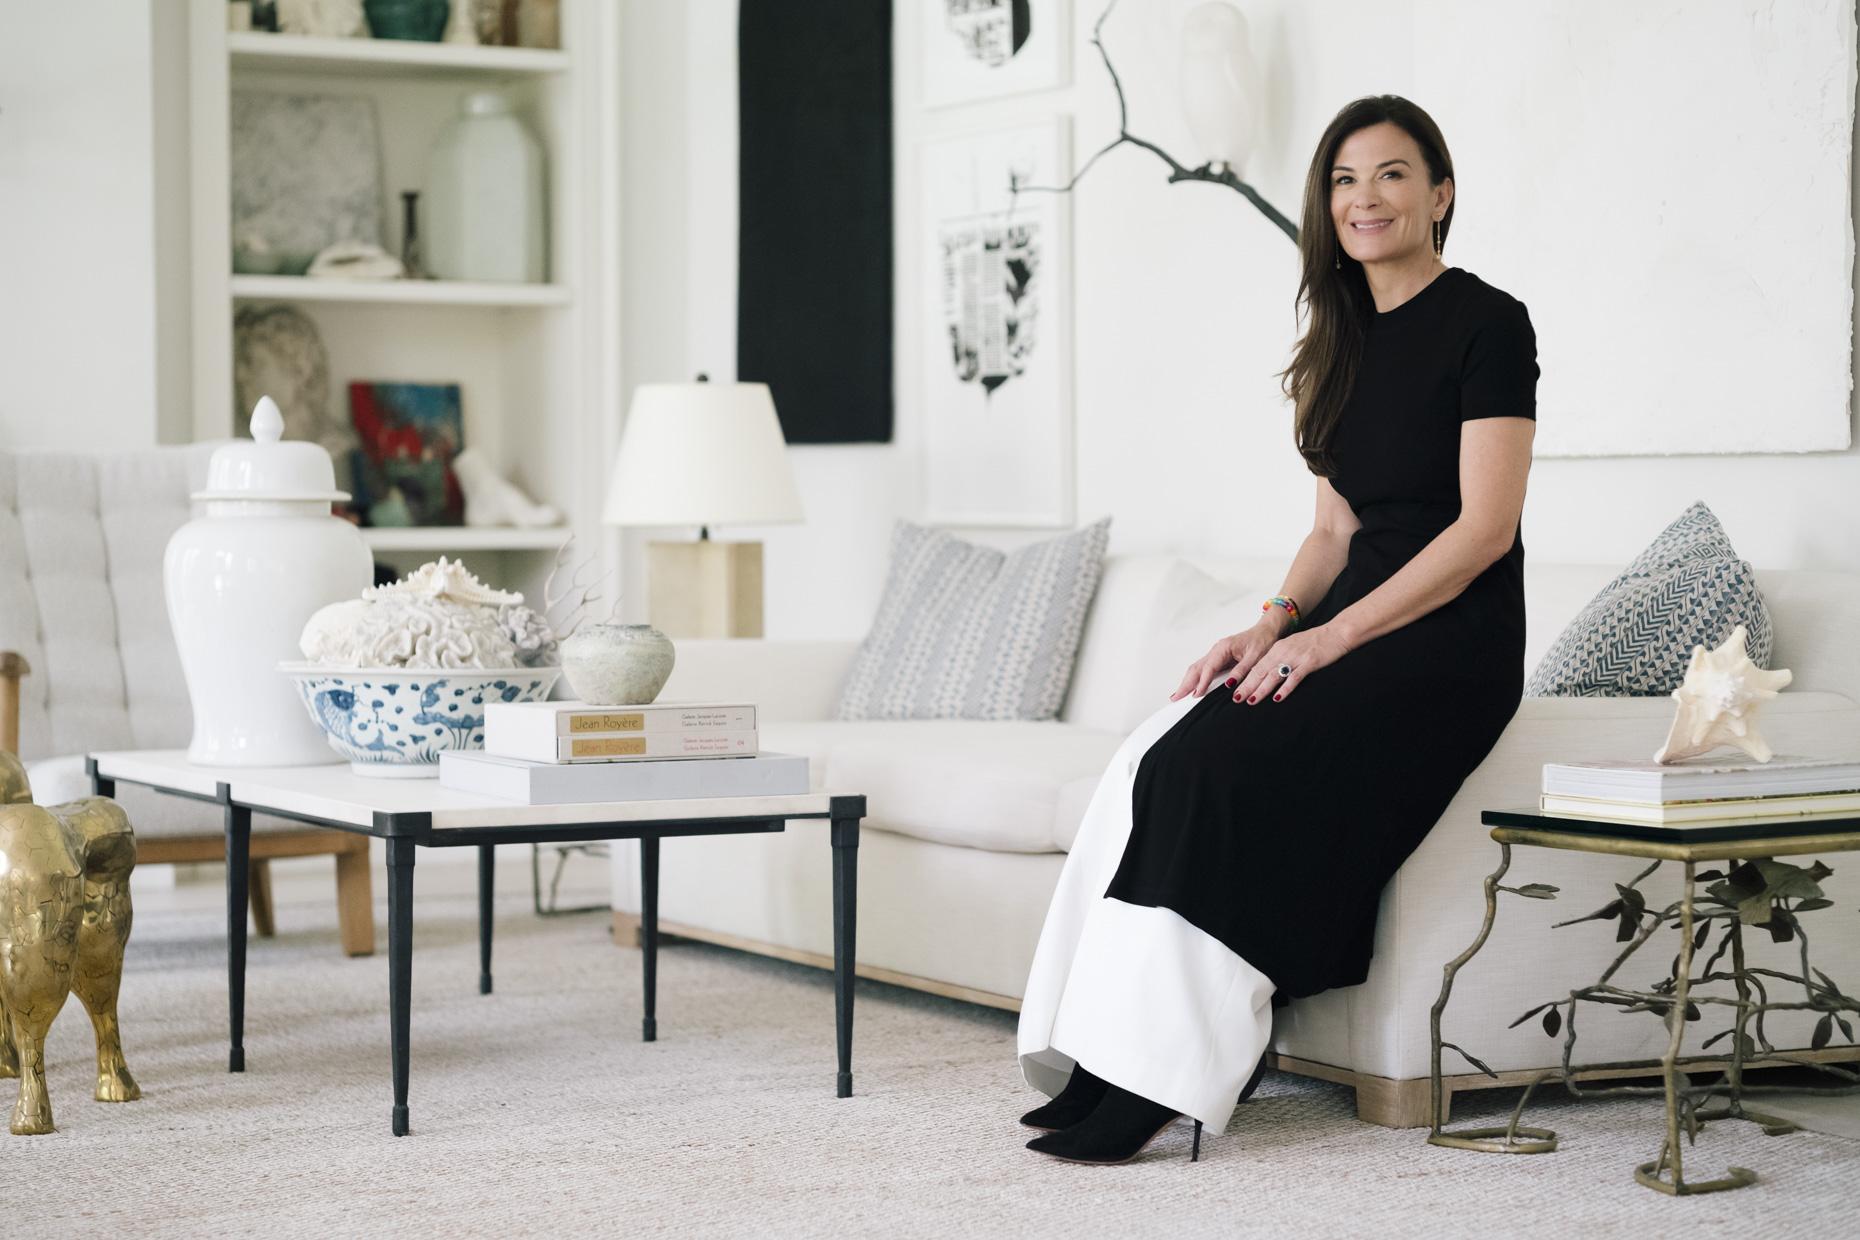 Sarah Harrelson at home, with artworks by David Wiseman, Analia Saban, Kaari Upson, and a tiny Janette Mundt in shelf. Courtesy of Sarah Harrelson.